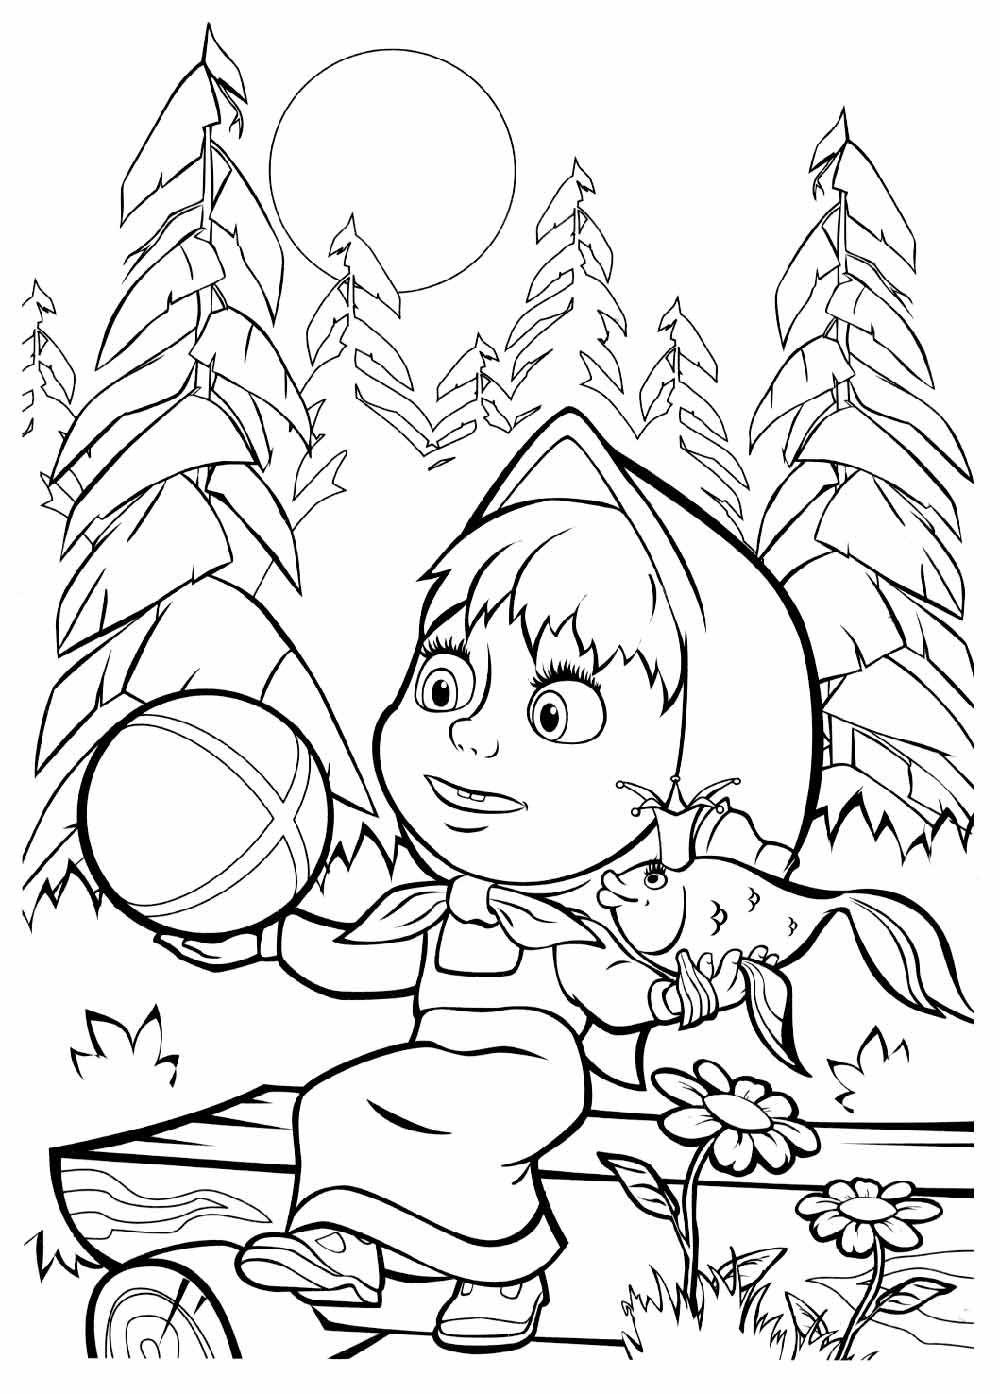 Tales Coloring Masha And The Bear Colouring